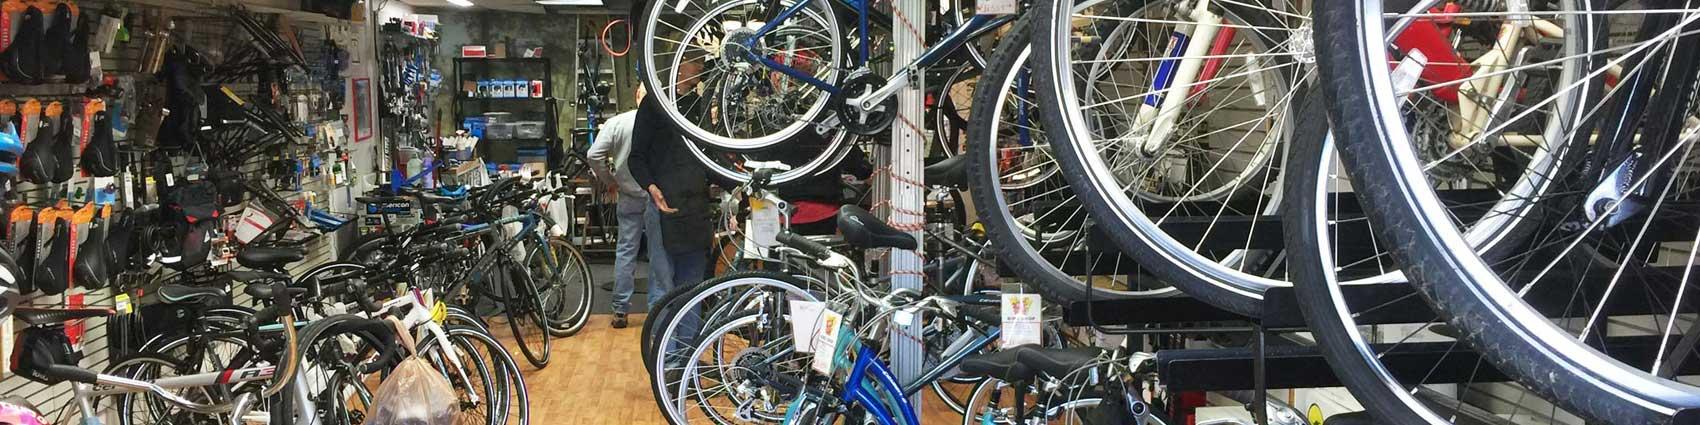 Wheel Nuts Bike Shop header sales1